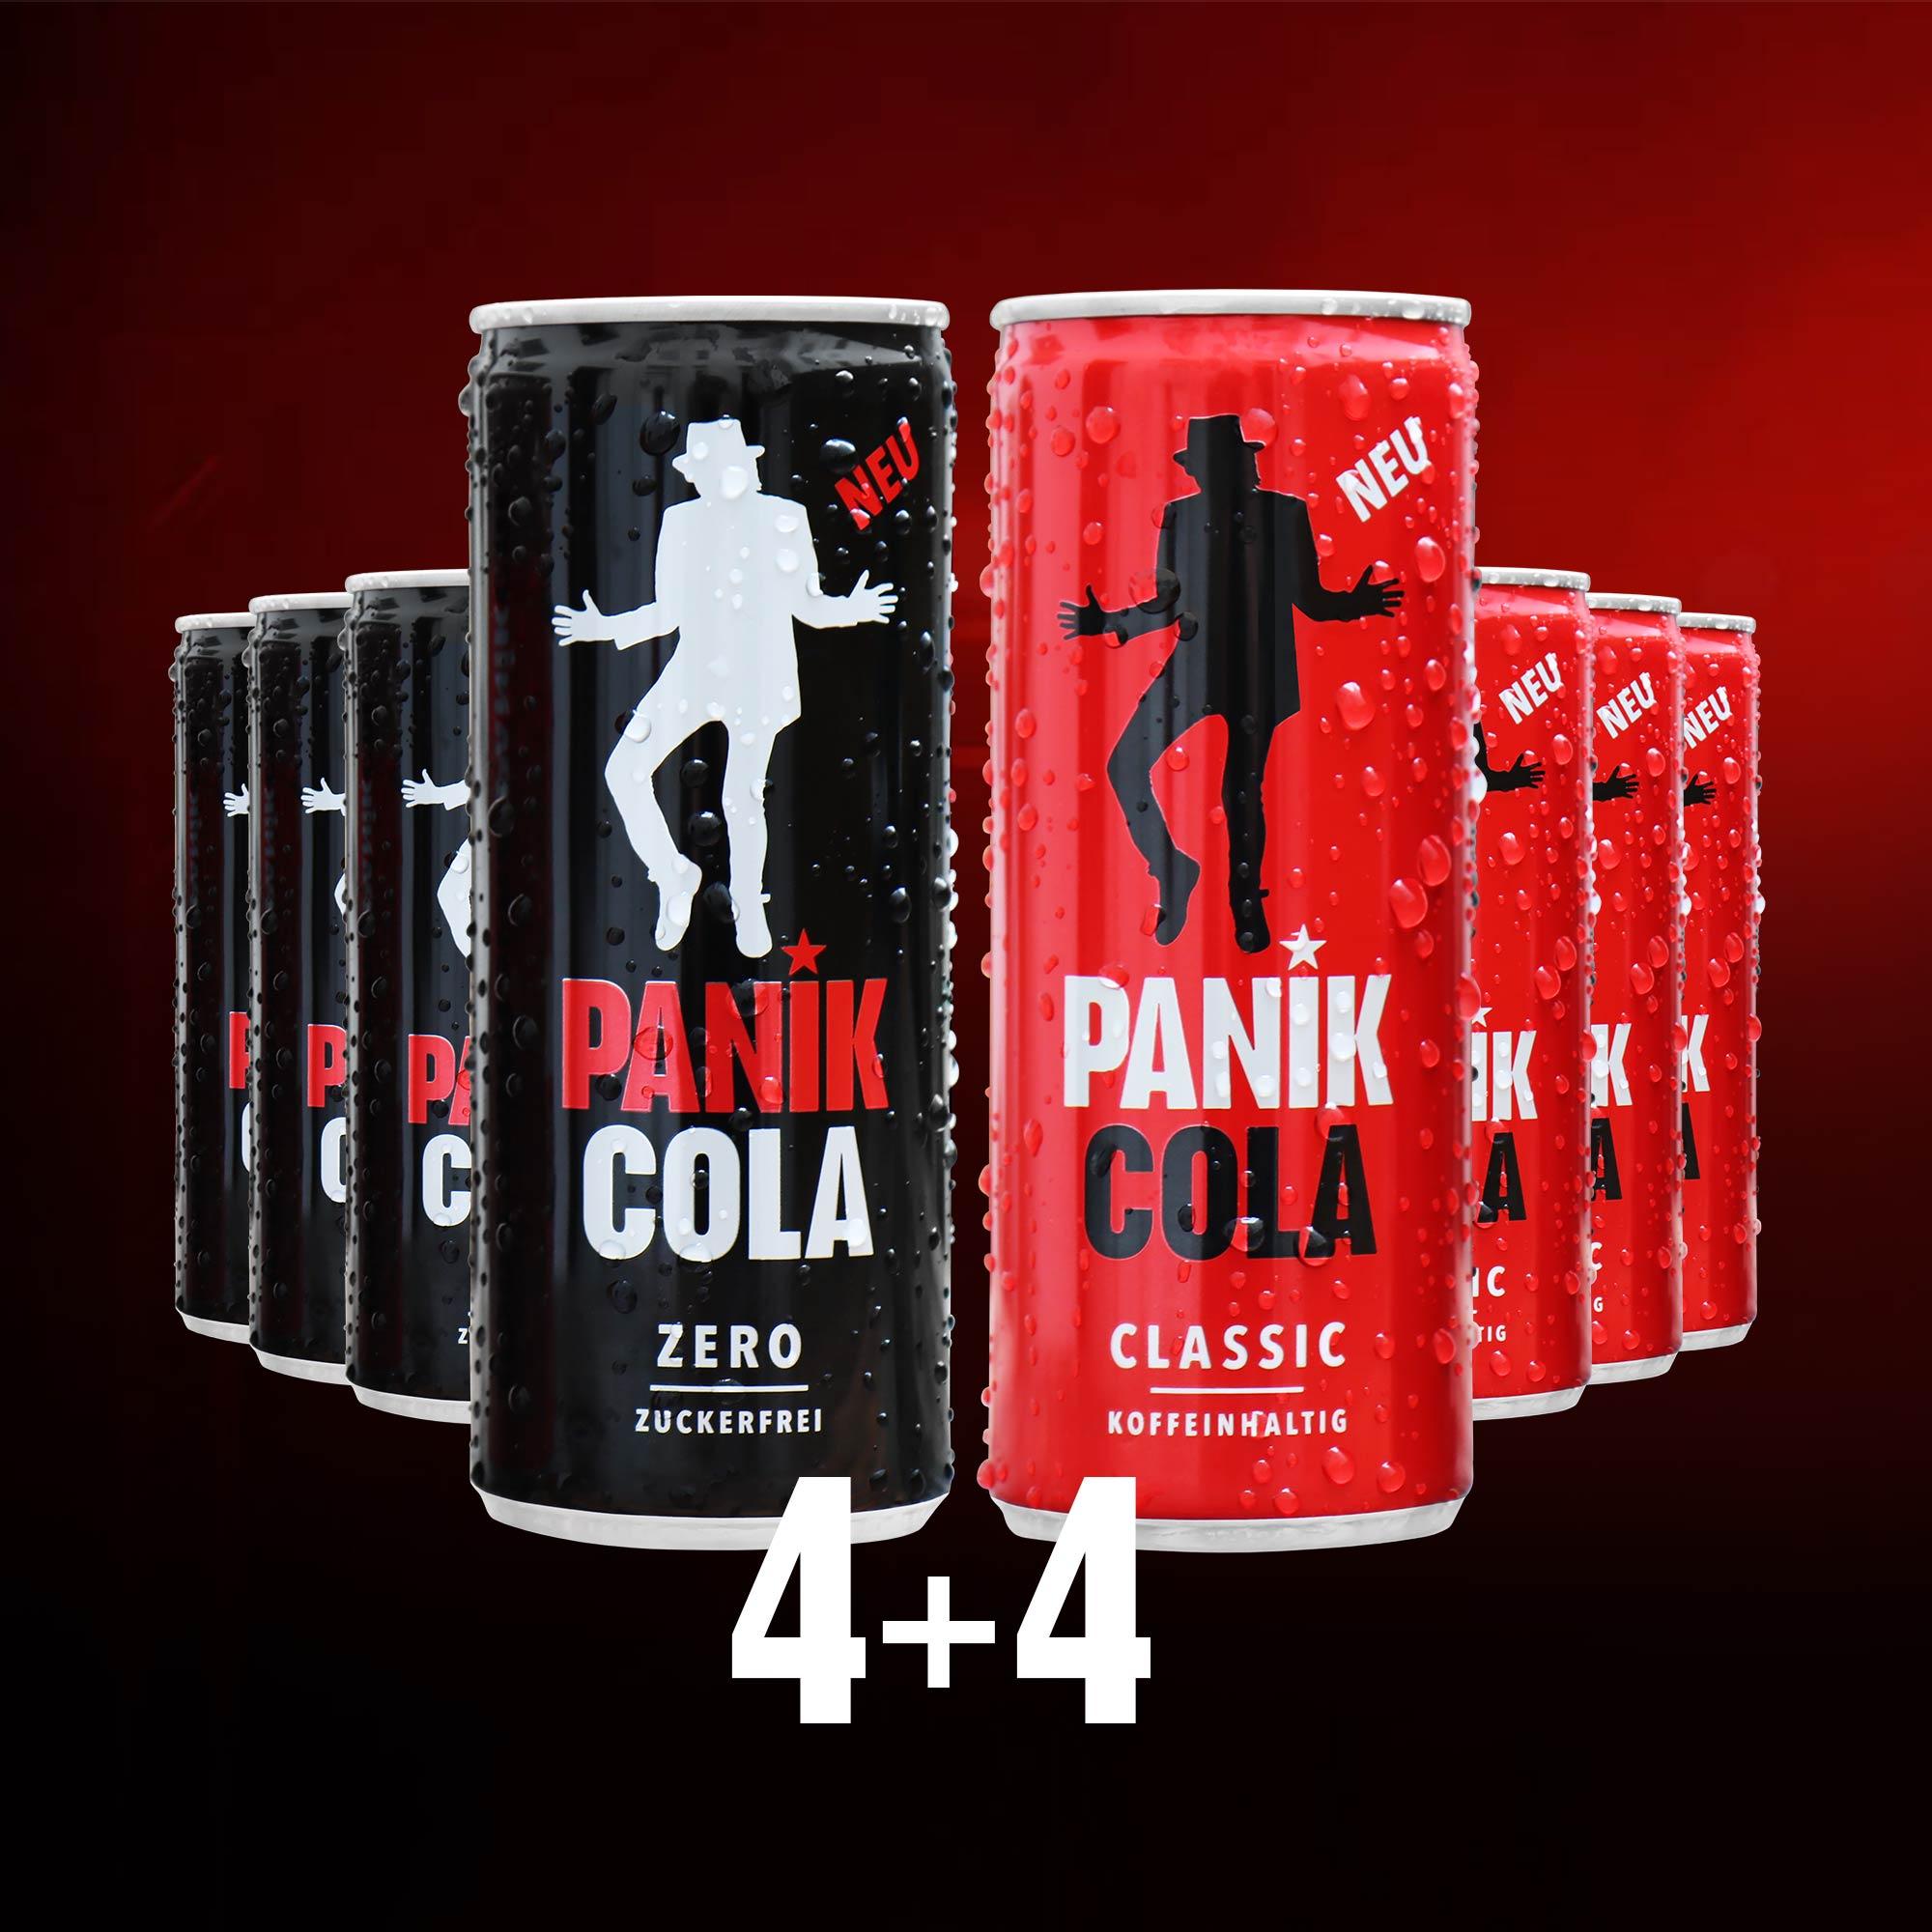 PANIK COLA Classic / Zero kaufen   PANIK COLA Zero   Inspiriert von Udo Lindenberg